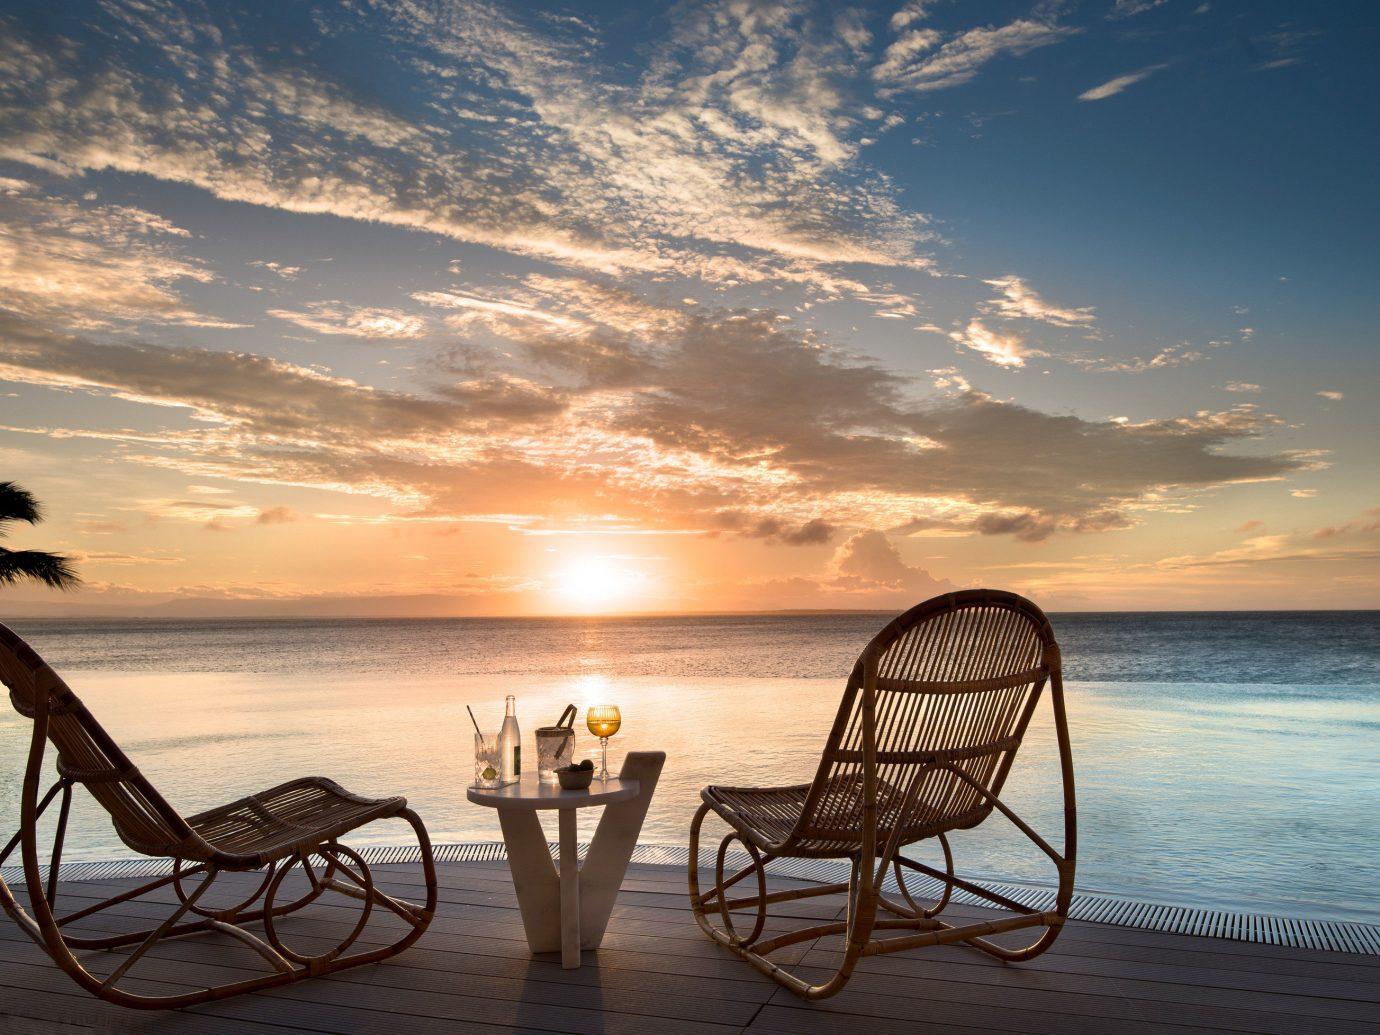 Trip Ideas water sky outdoor chair Beach Sea Sunset body of water horizon sunrise Ocean shore cloud vacation morning caribbean evening tropics calm dawn dusk Sun set overlooking sandy